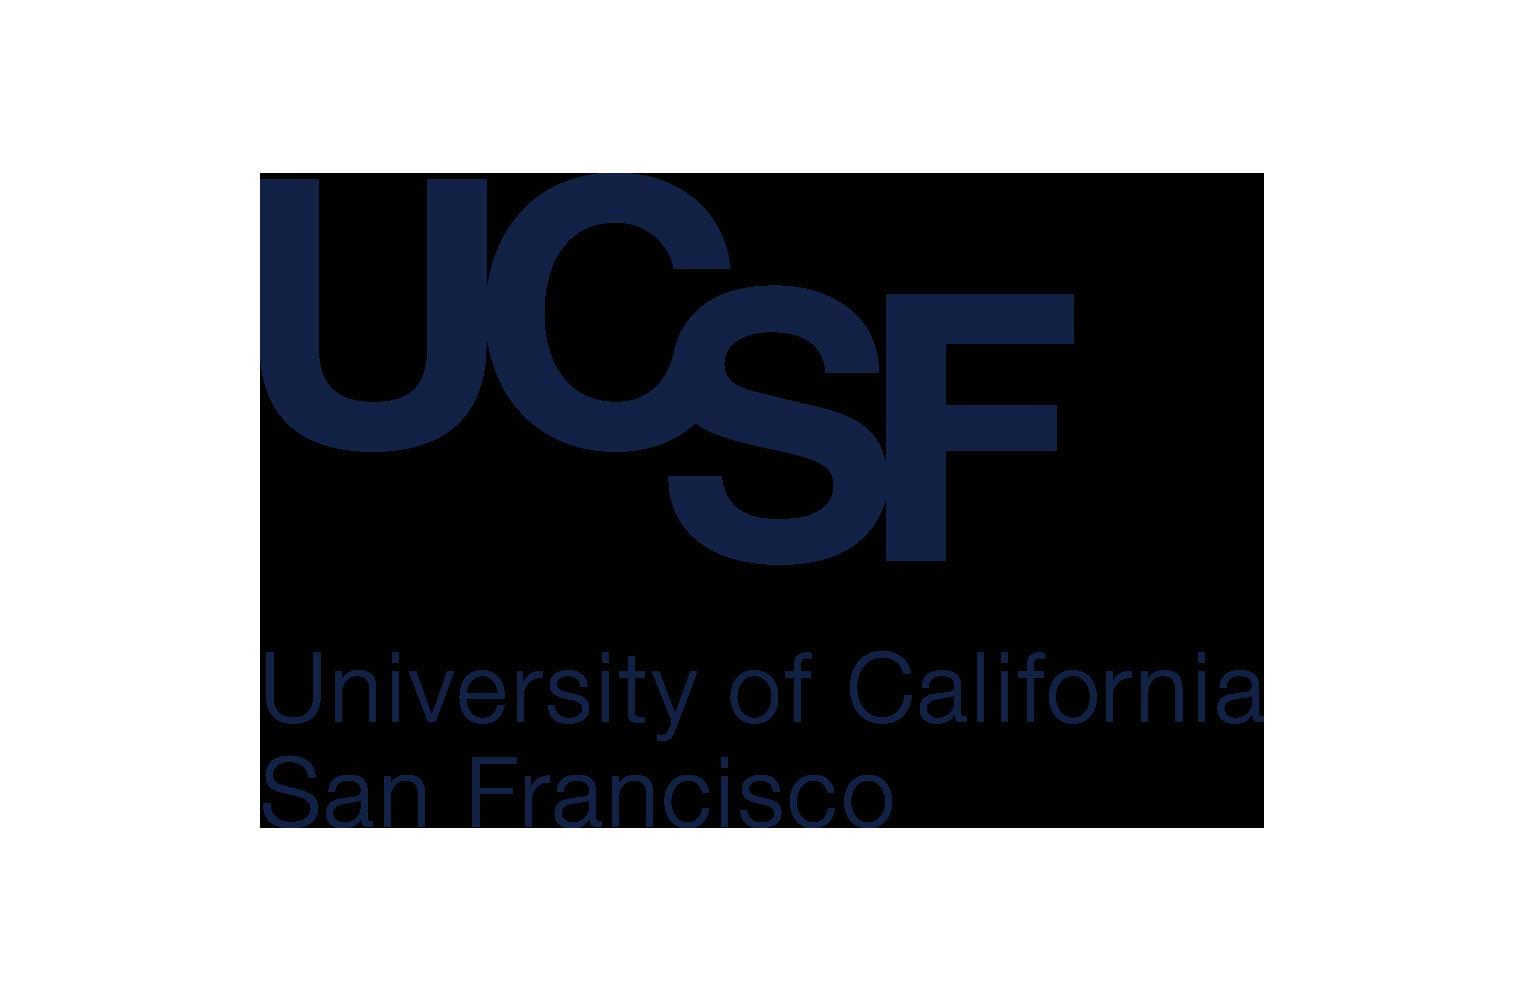 UCSF_sig_navy_RGB.png